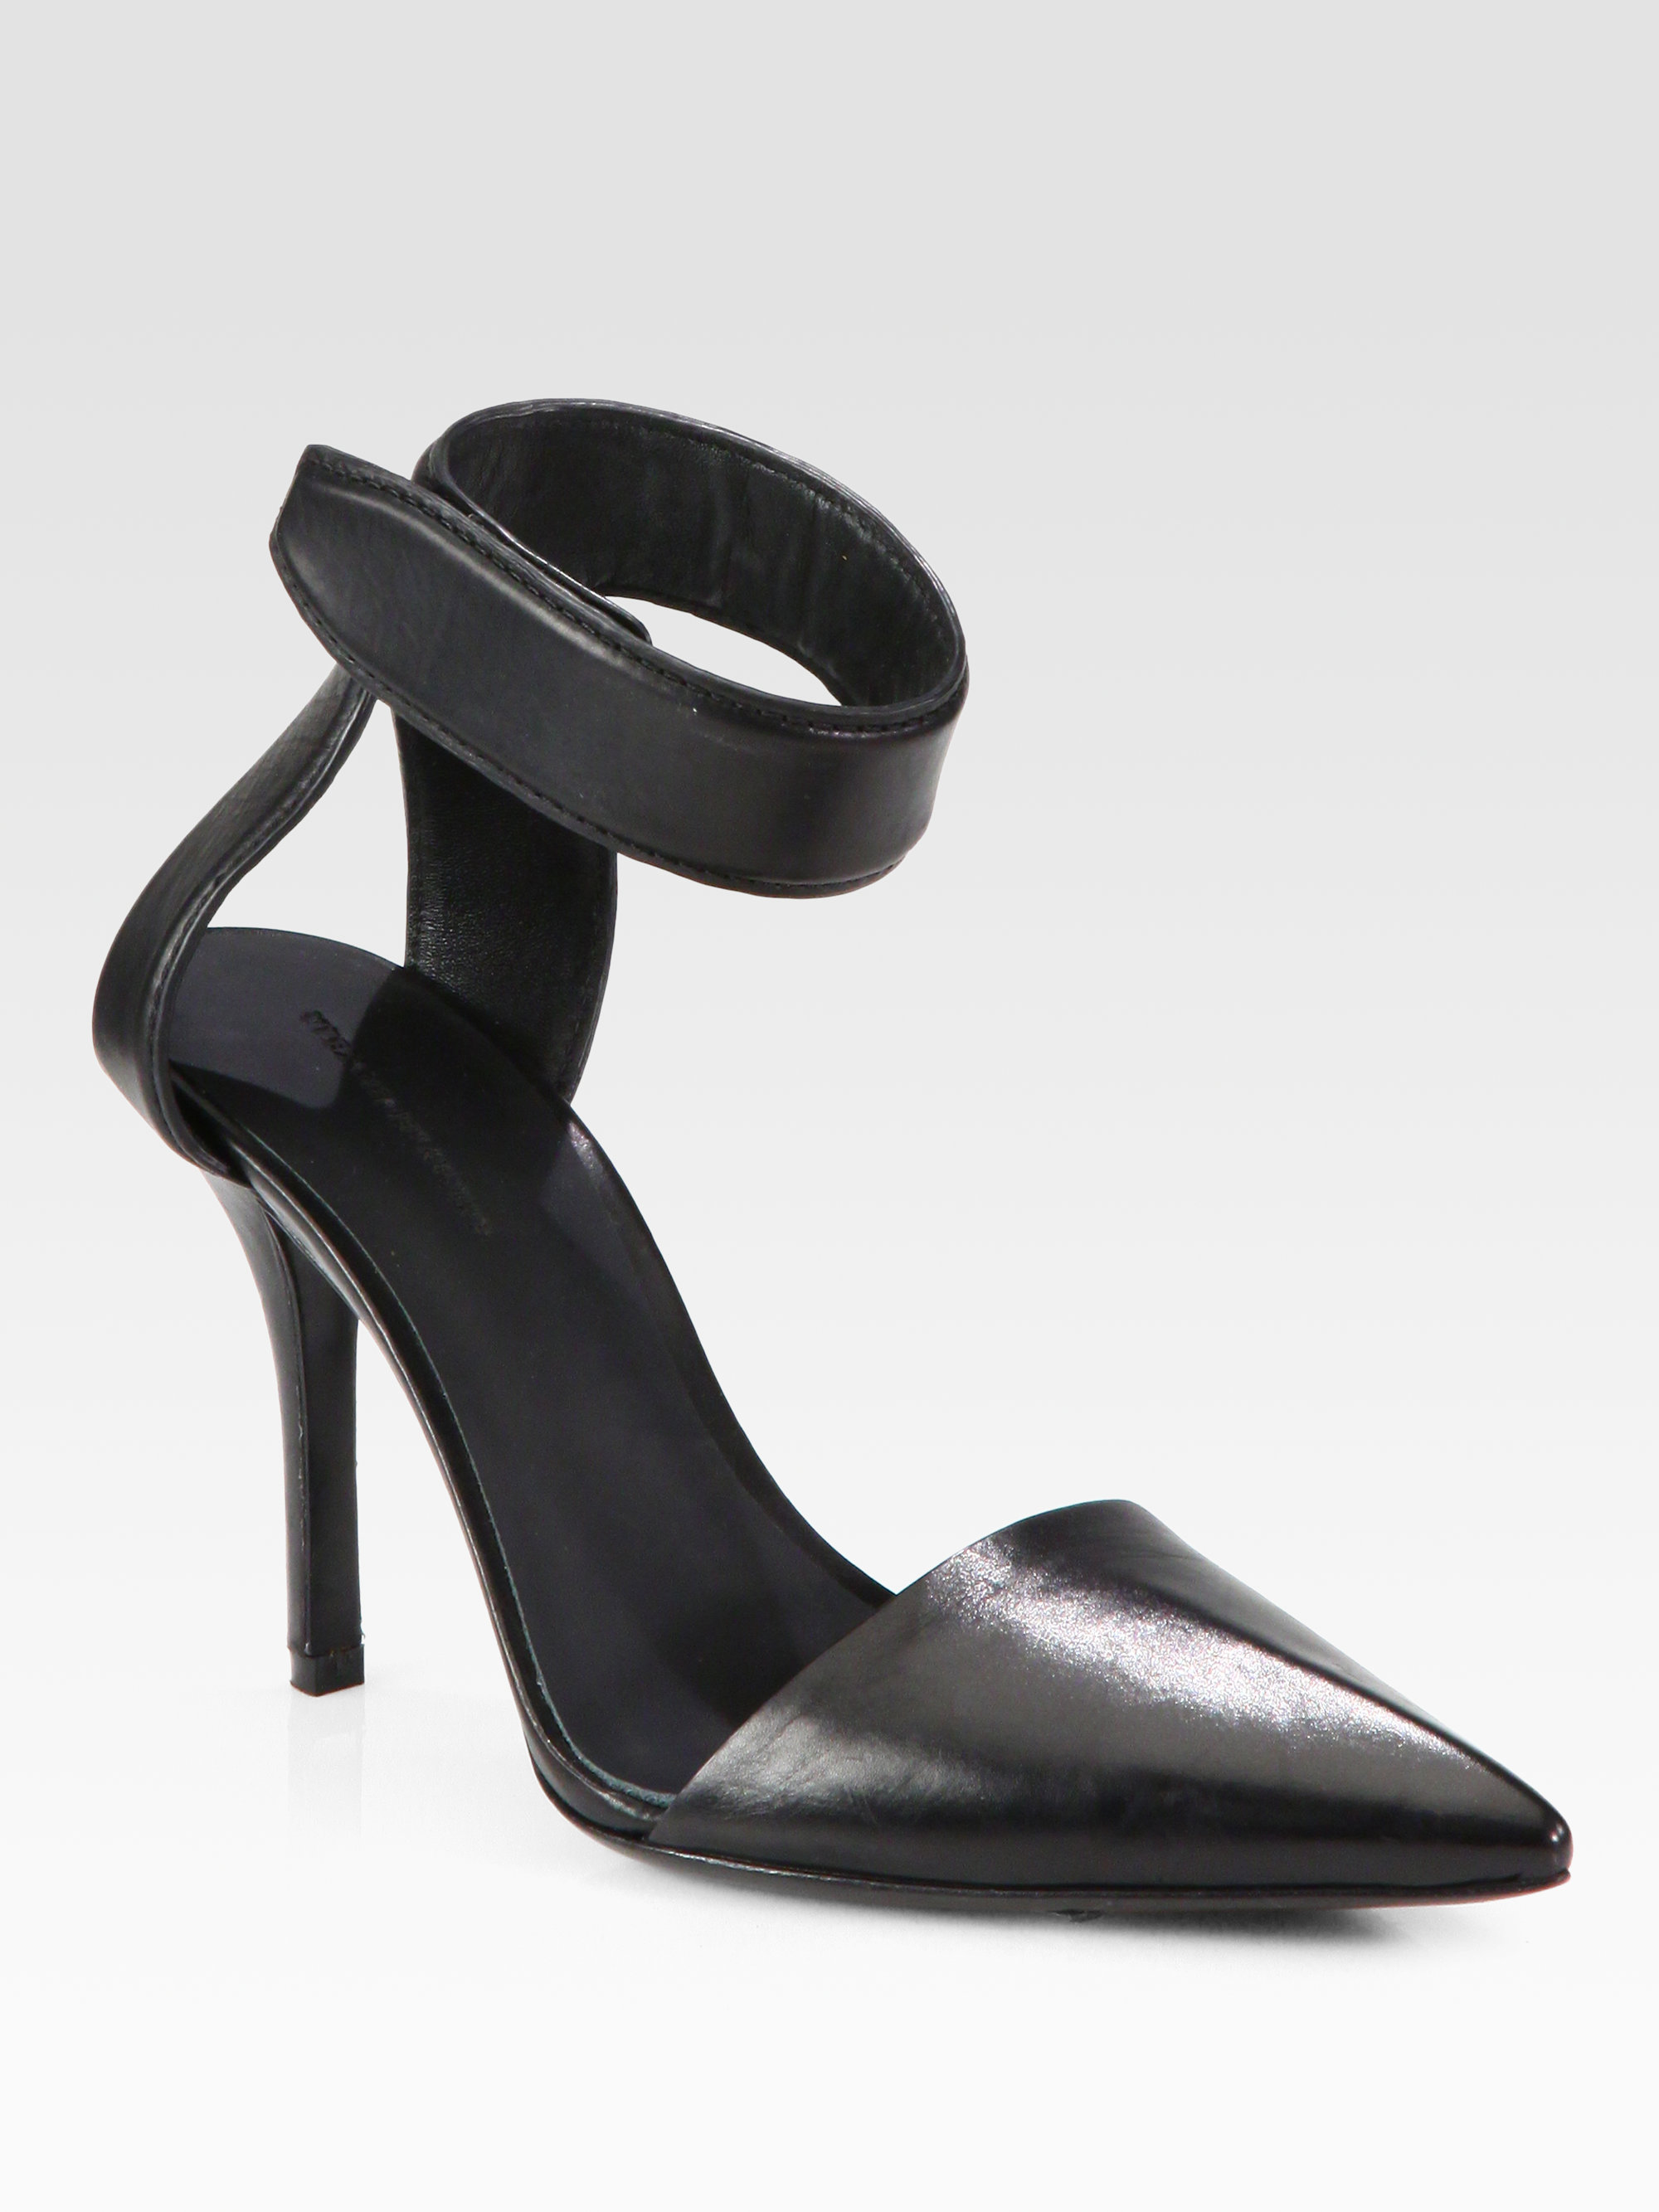 latest online cheap sale enjoy Alexander Wang Leather Ankle-Strap Pumps low shipping cheap online UQtslslhh